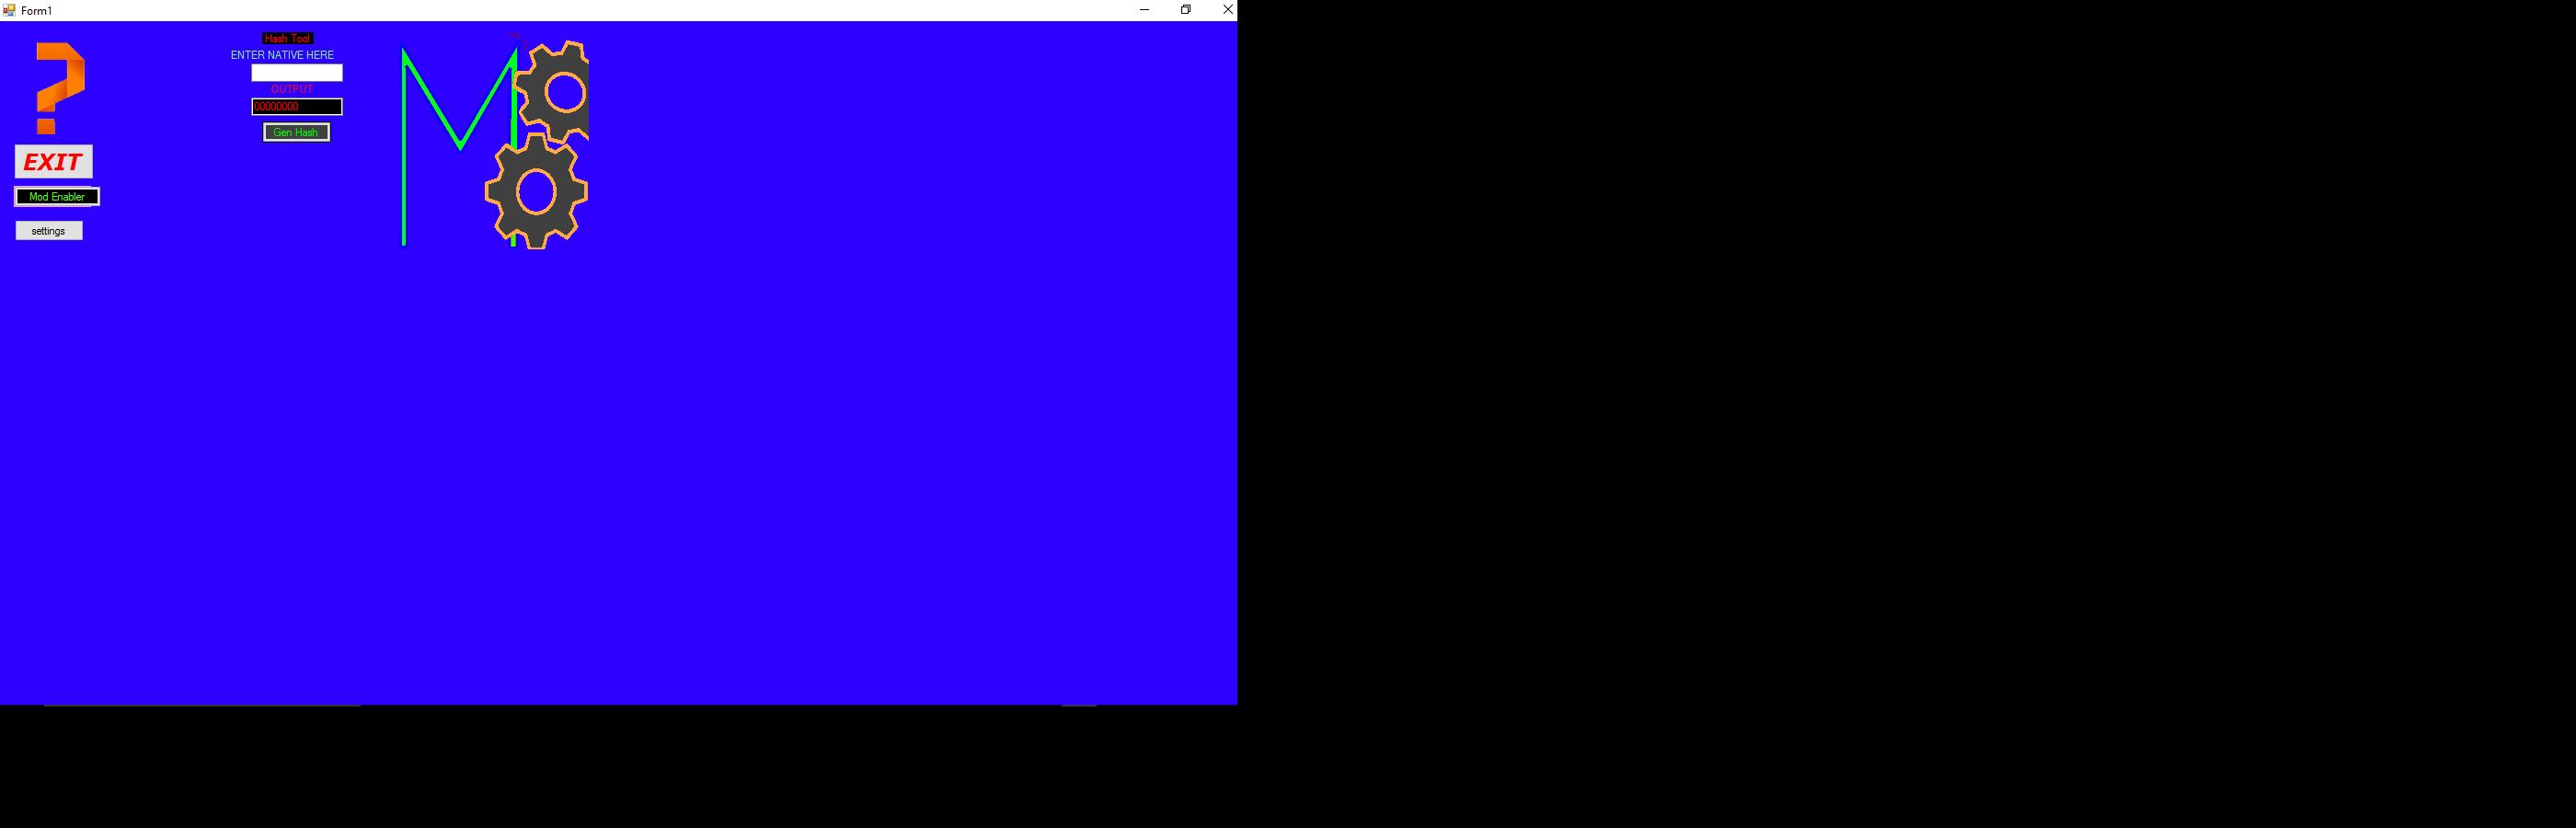 Google chrome theme gta v - Afba67 Screenshot 33